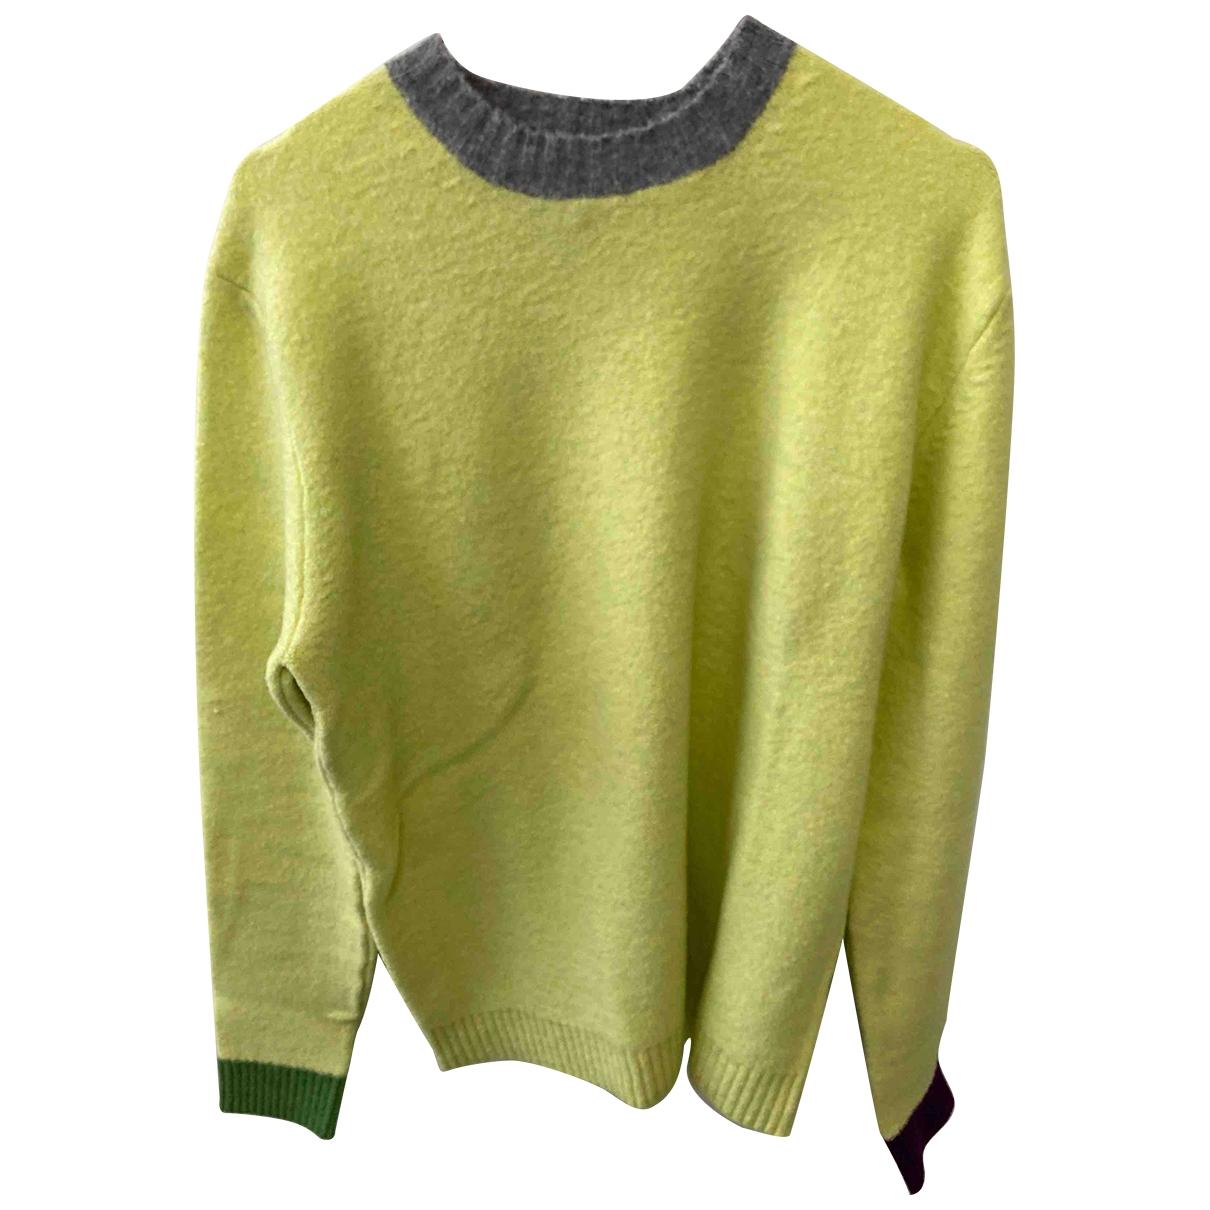 Mauro Grifoni \N Yellow Knitwear & Sweatshirts for Men 48 IT